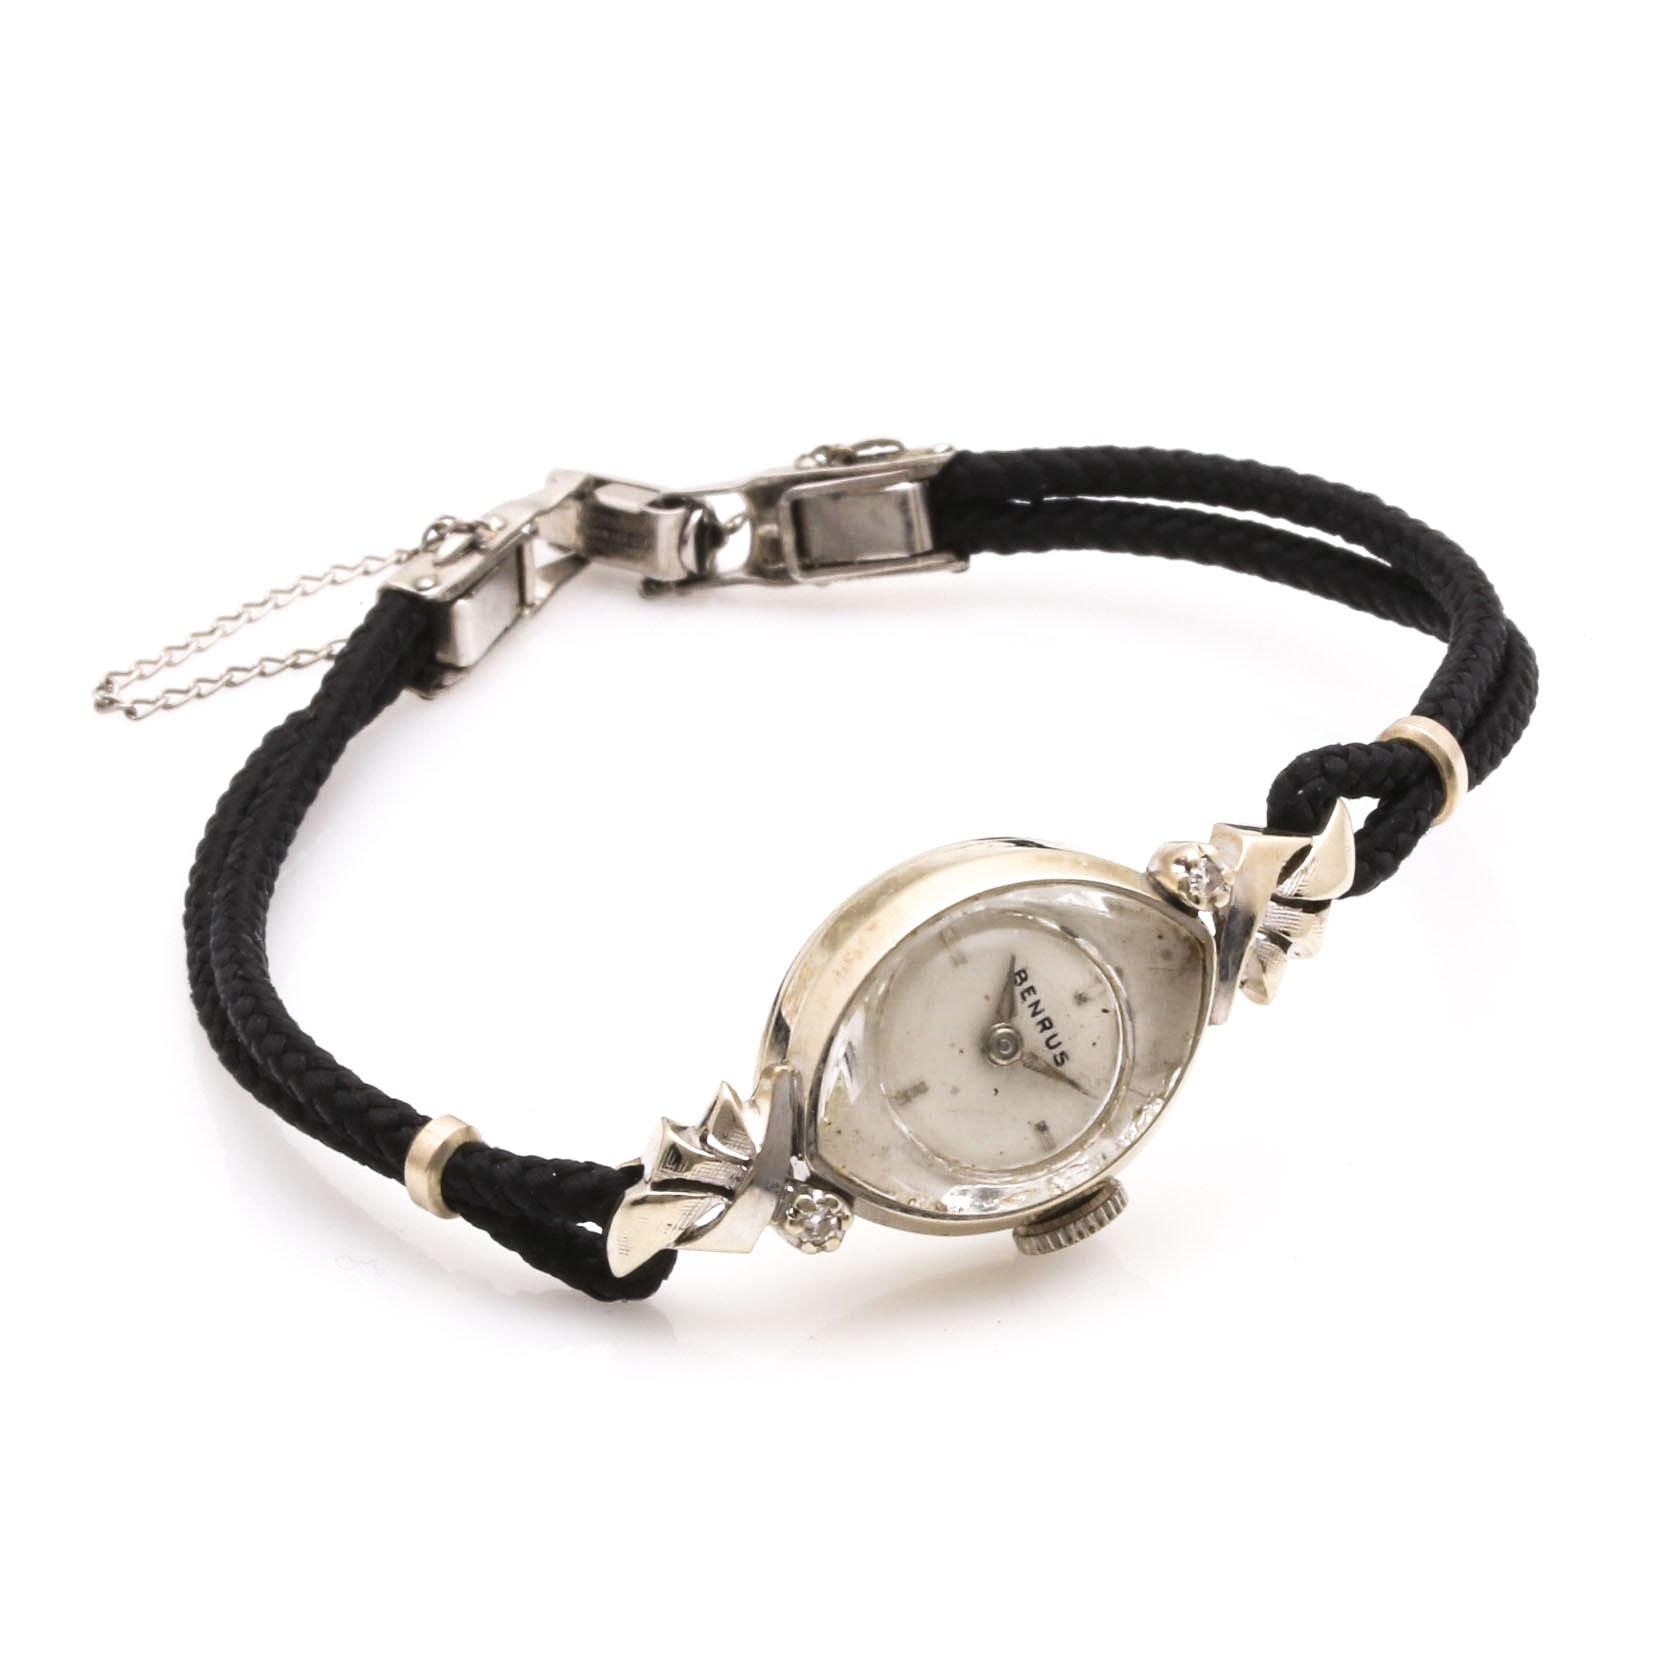 Women's Benrus Wristwatch